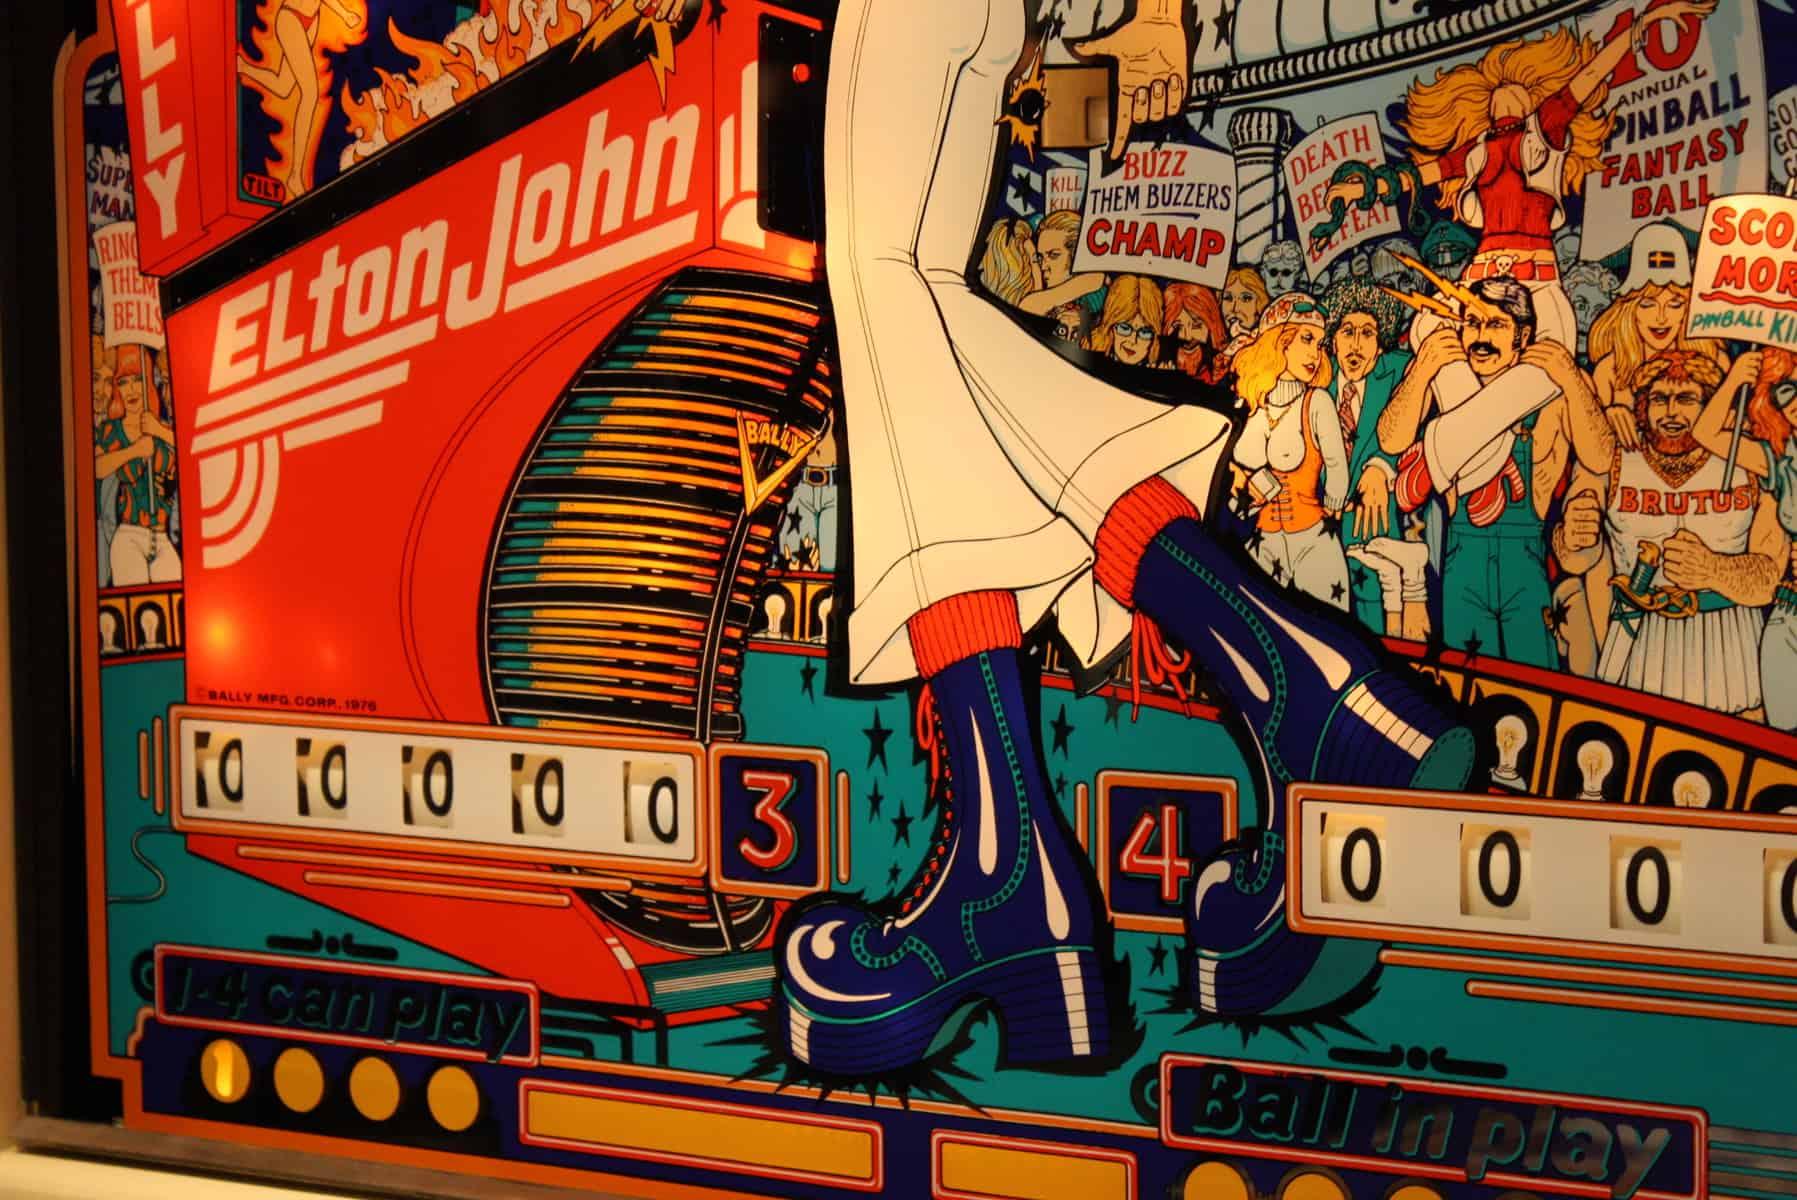 Der Original-Pinball-Wizard-Flipper im CBGB (via Flickr)